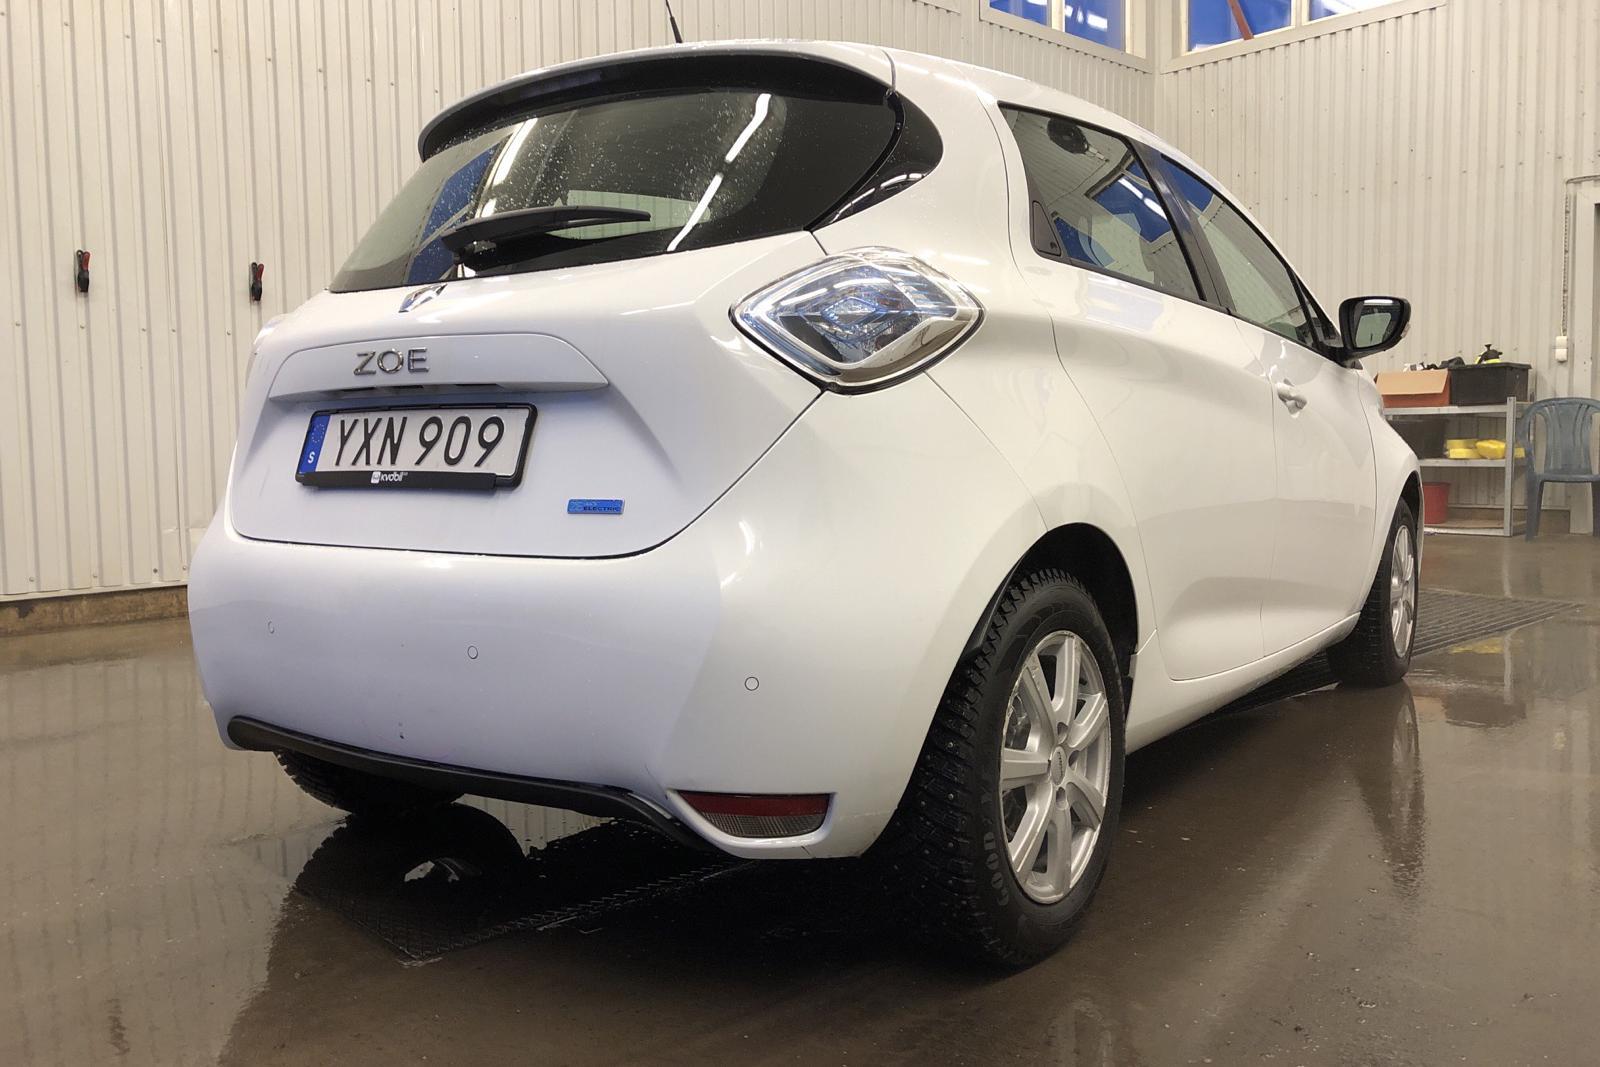 Renault Zoe 41 kWh R90 (92hk) - 82 440 km - Automatic - white - 2019